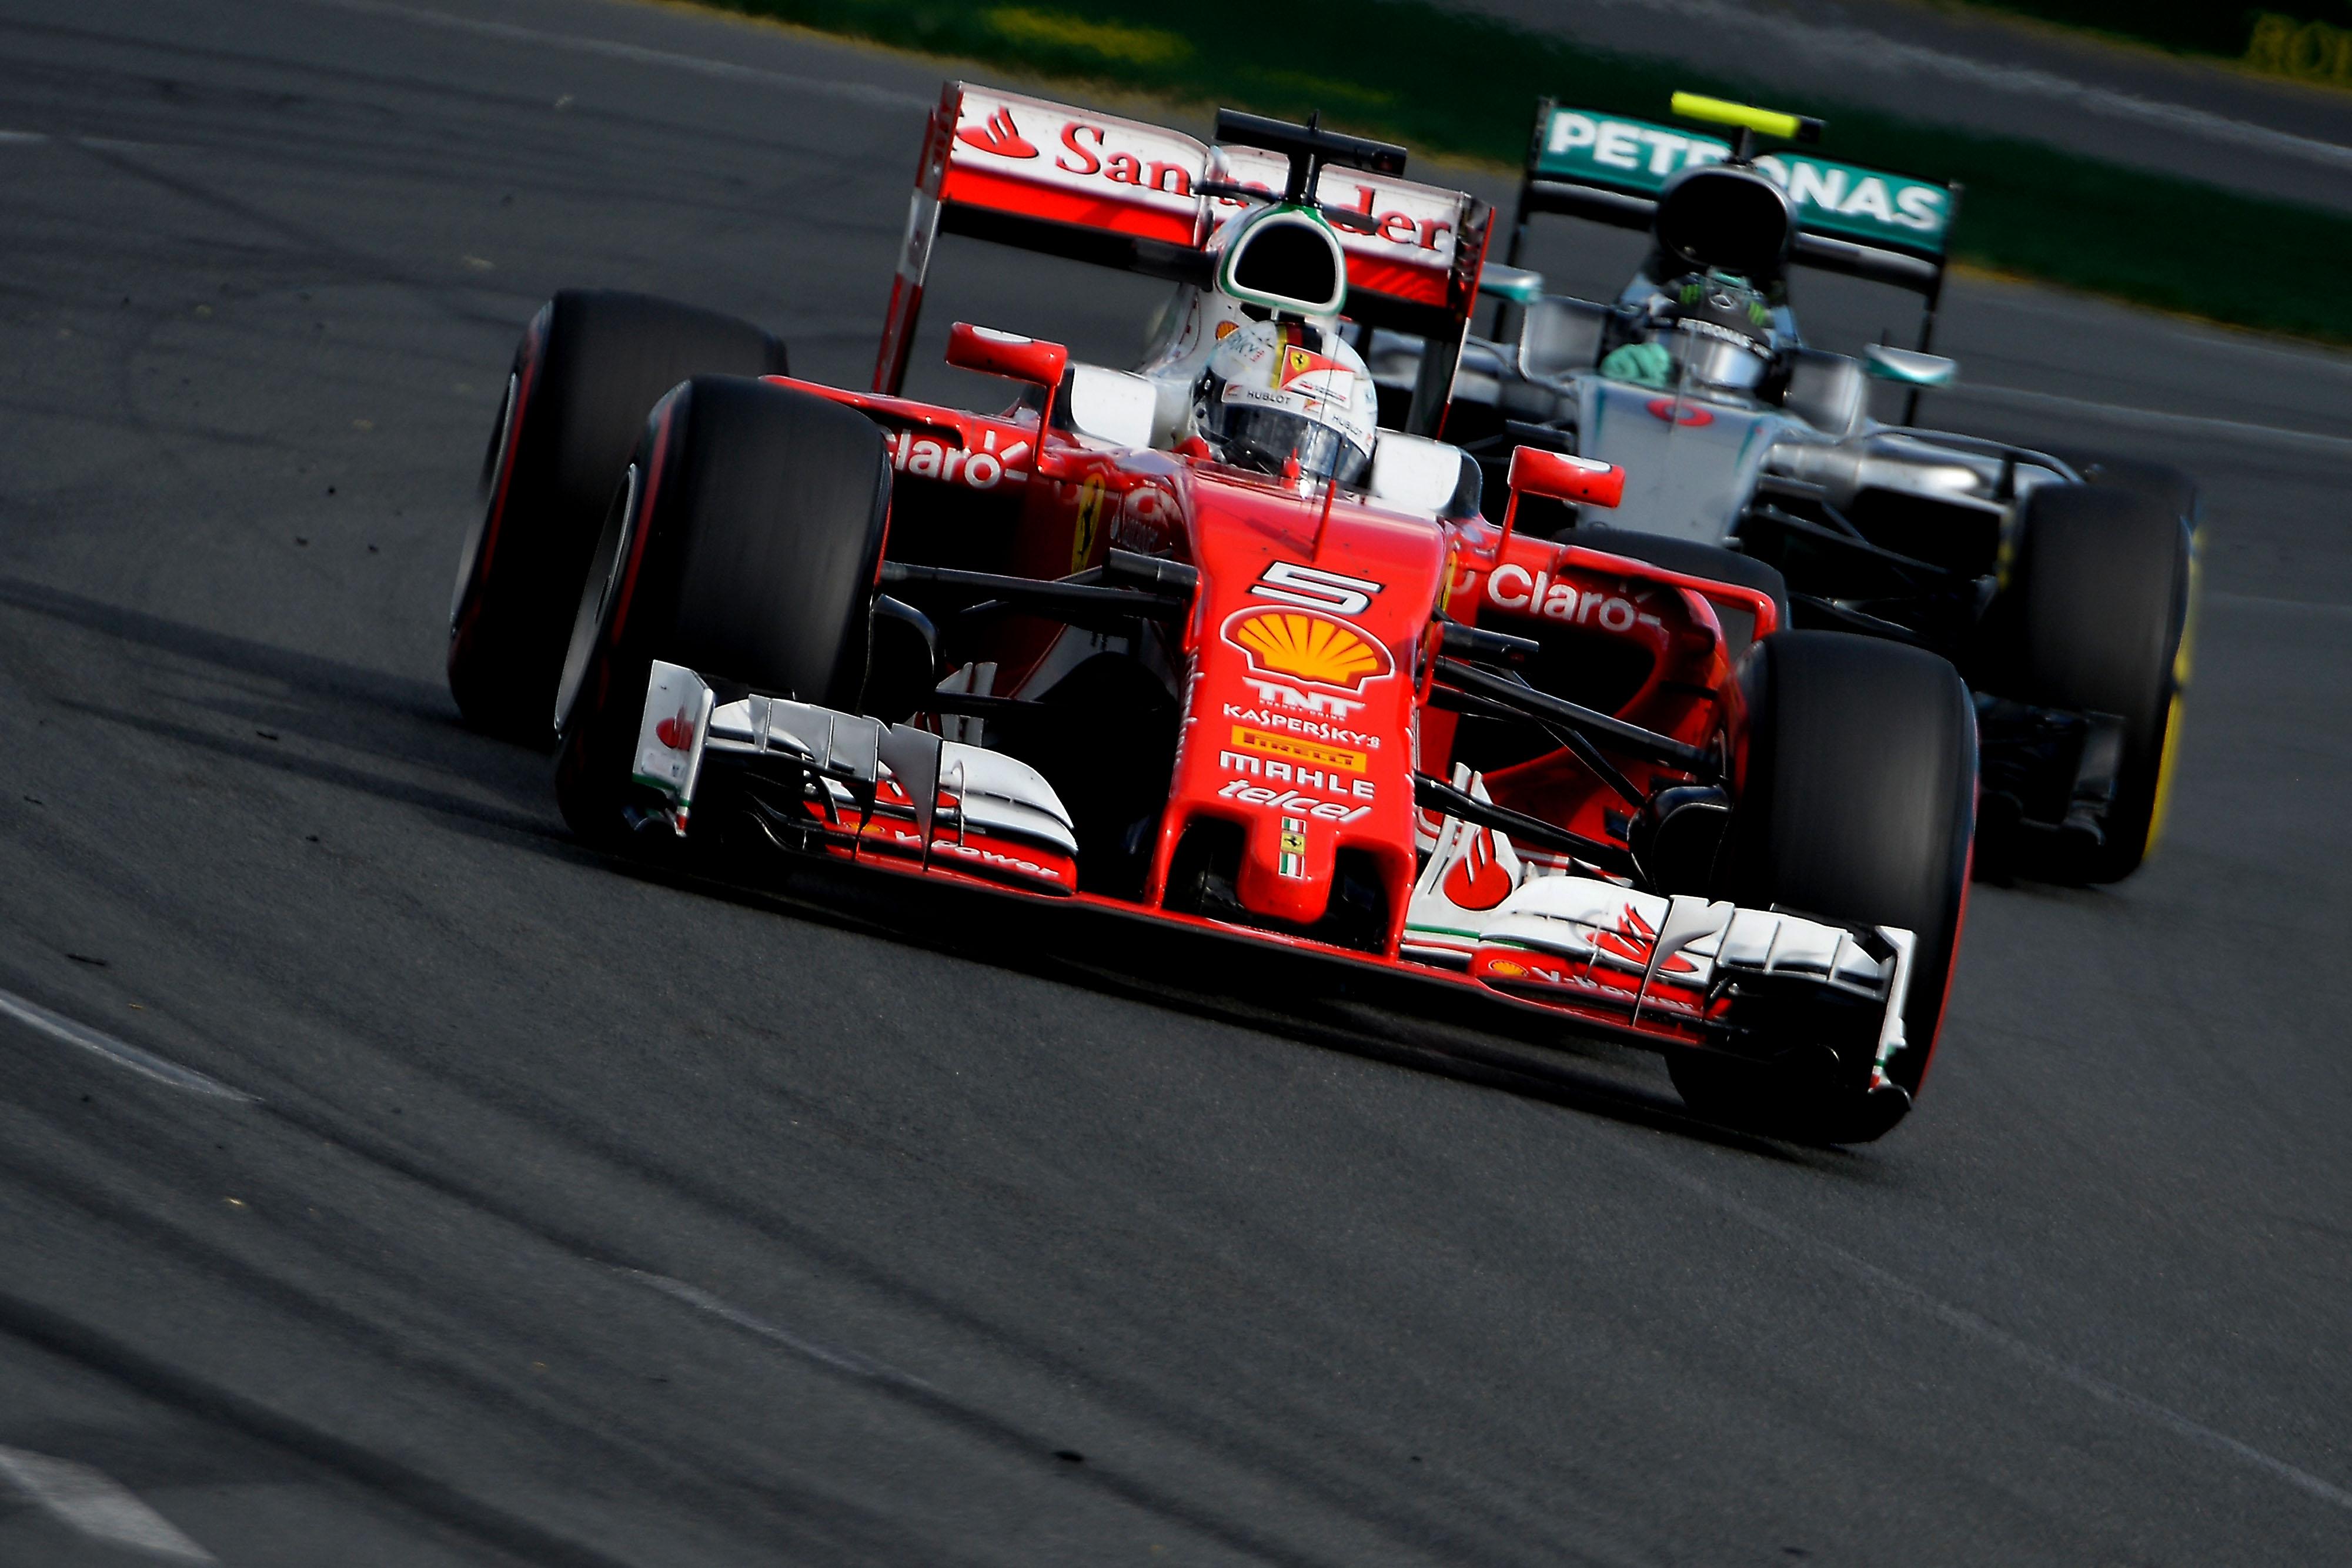 F1 | Ferrari pensa già al motore 2018